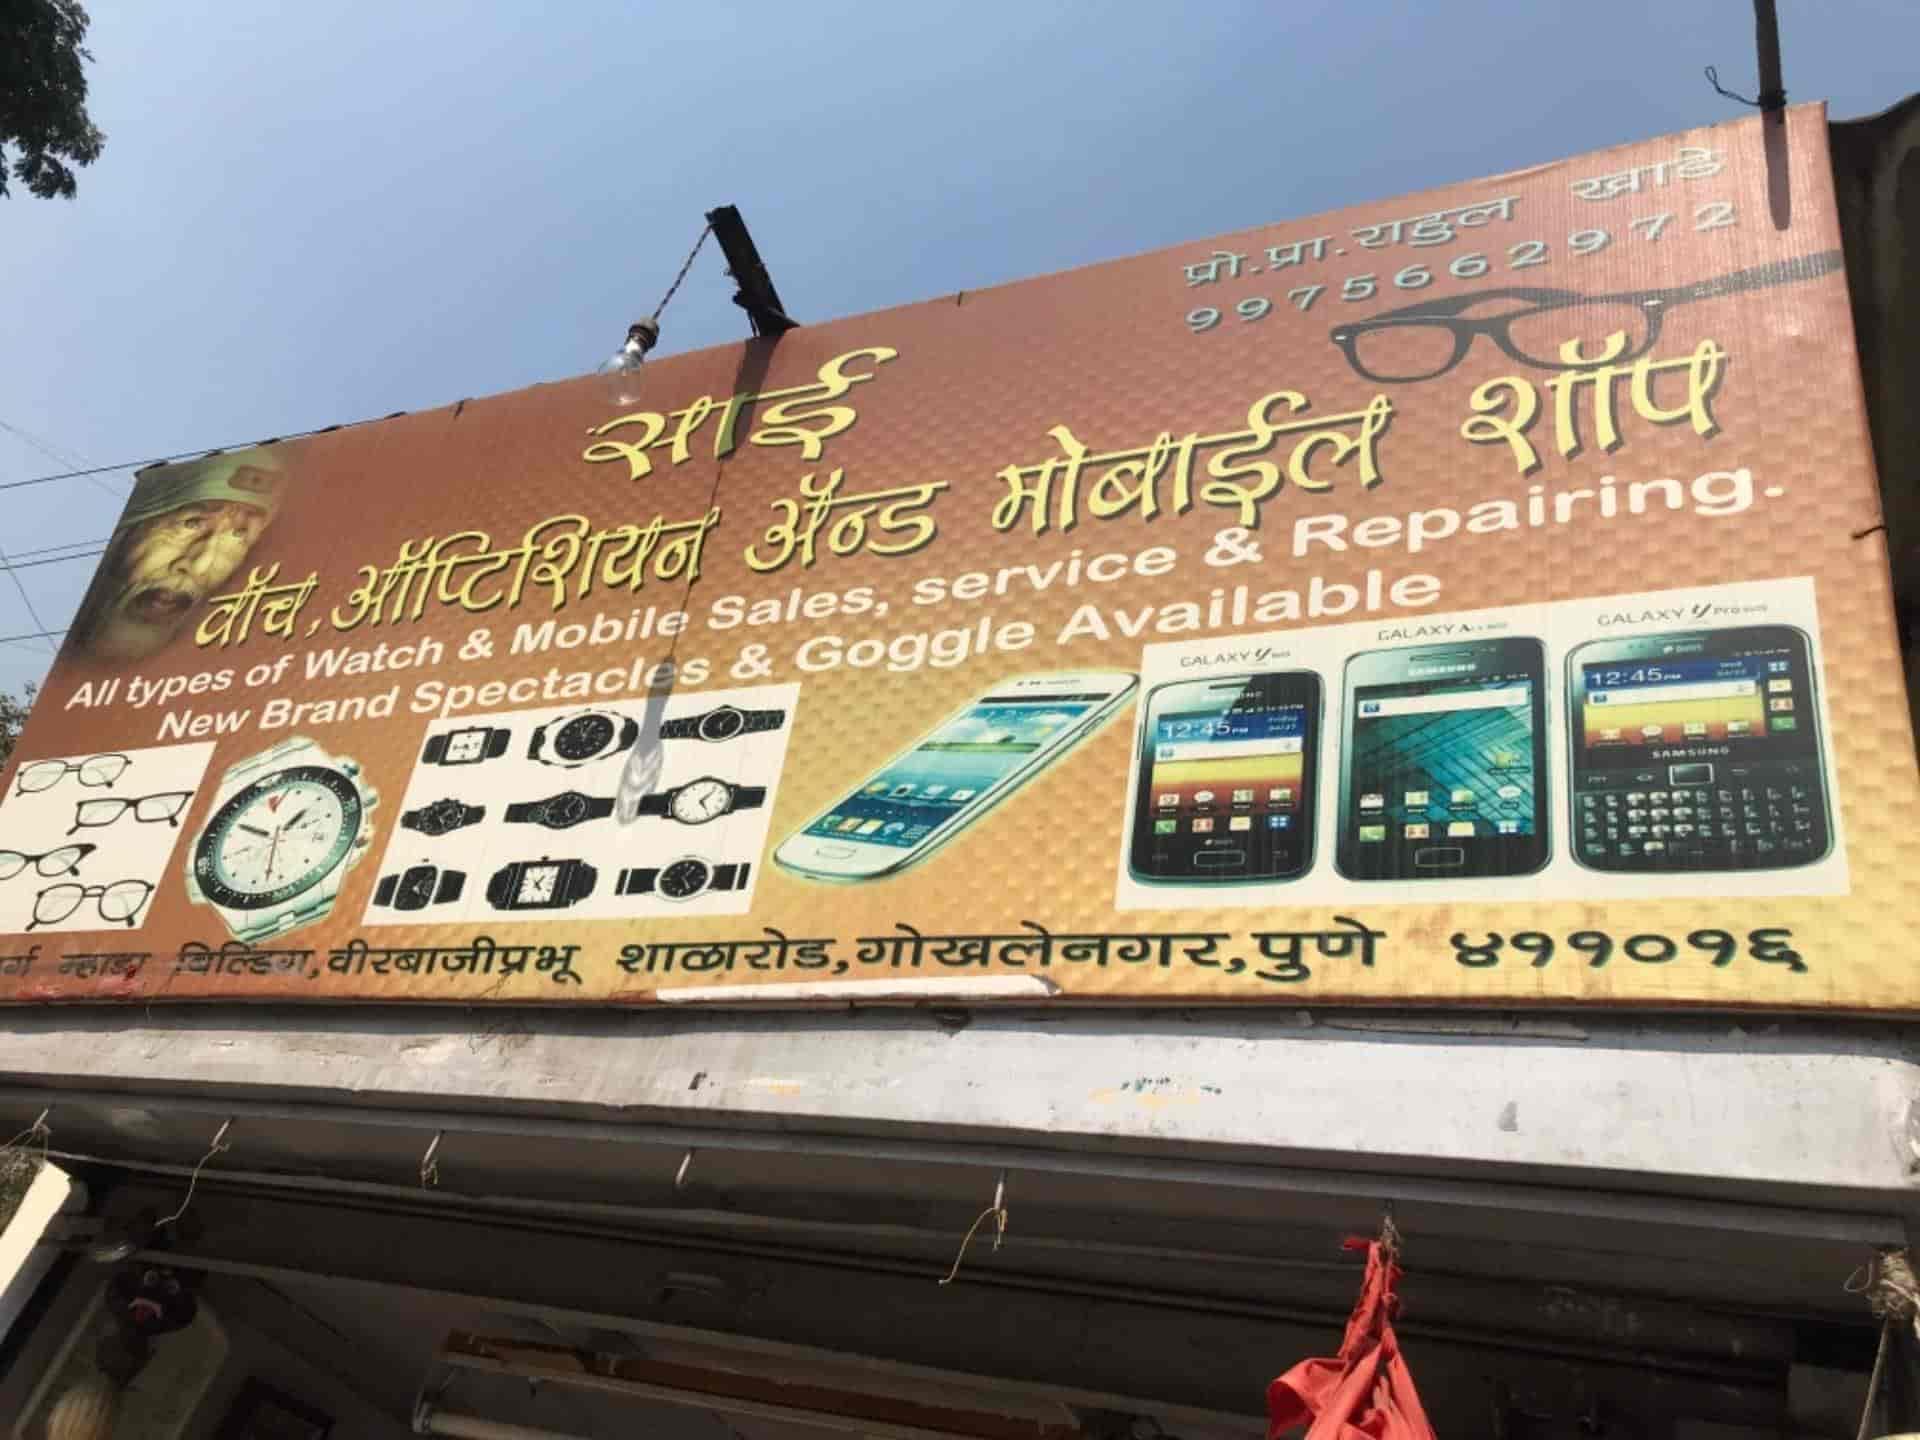 Saiwatch Optician Mobile Shoppee Gokhale Nagar Sai Watch